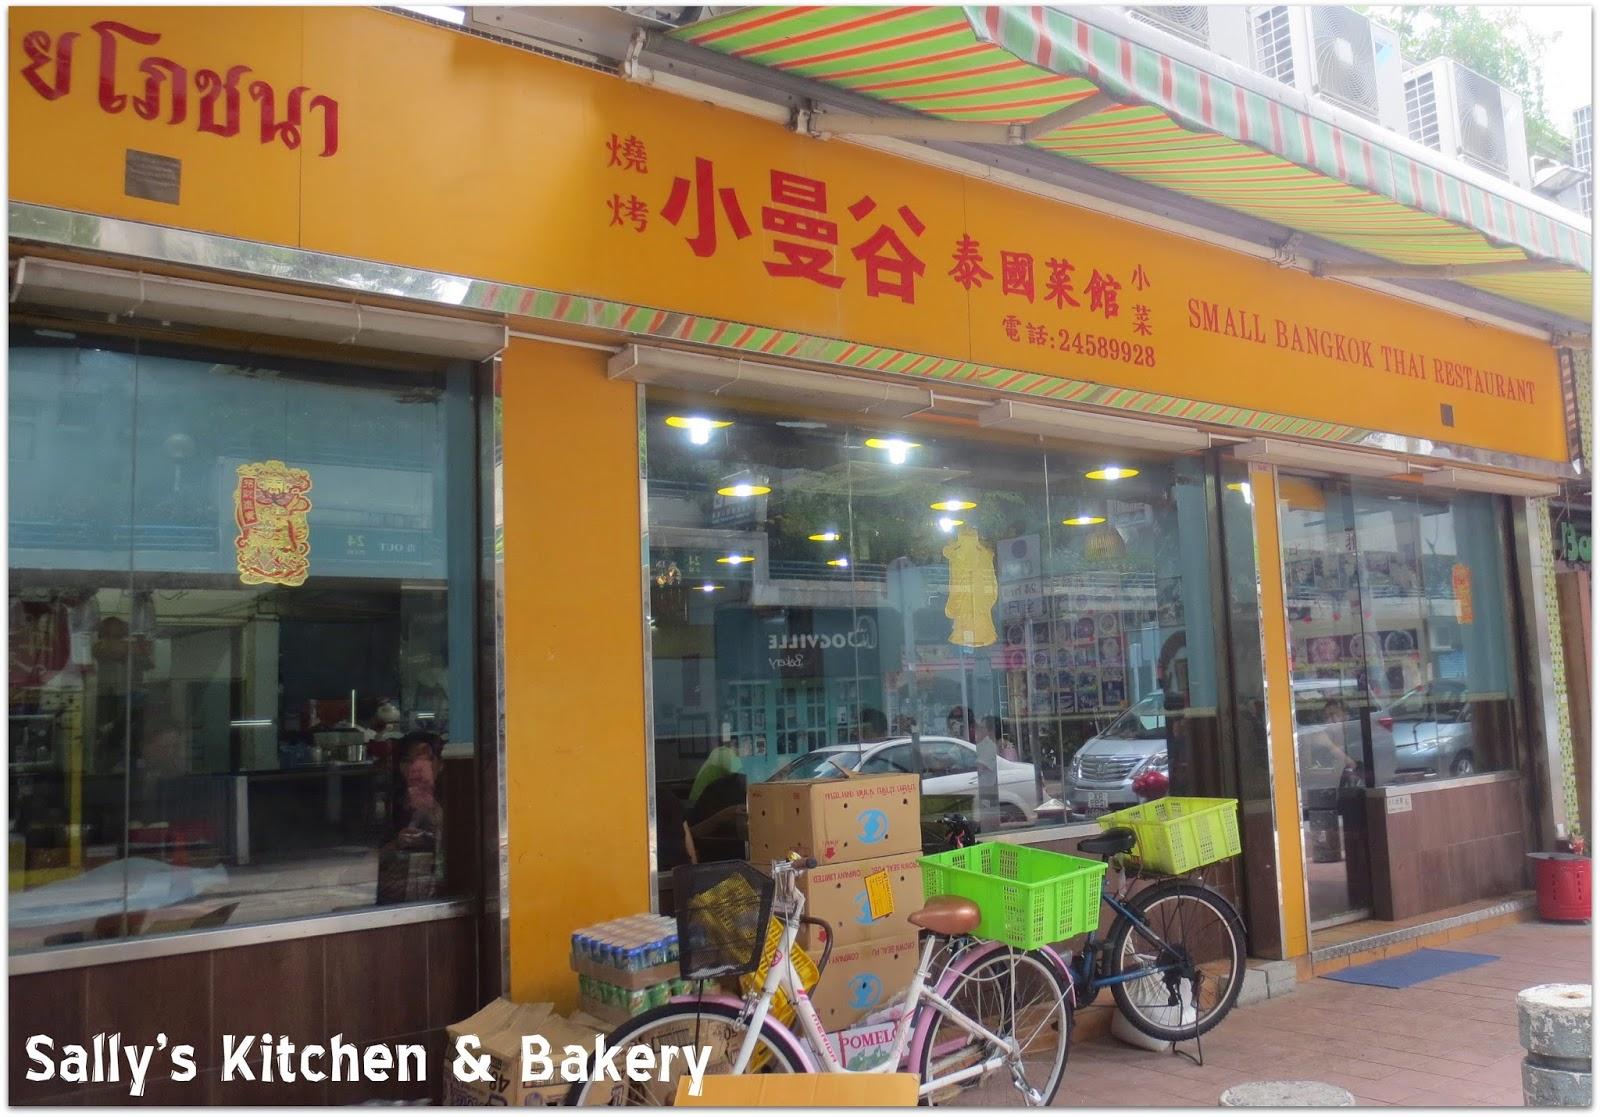 Sally's Kitchen & Bakery: 小曼谷泰國菜館 (屯門)